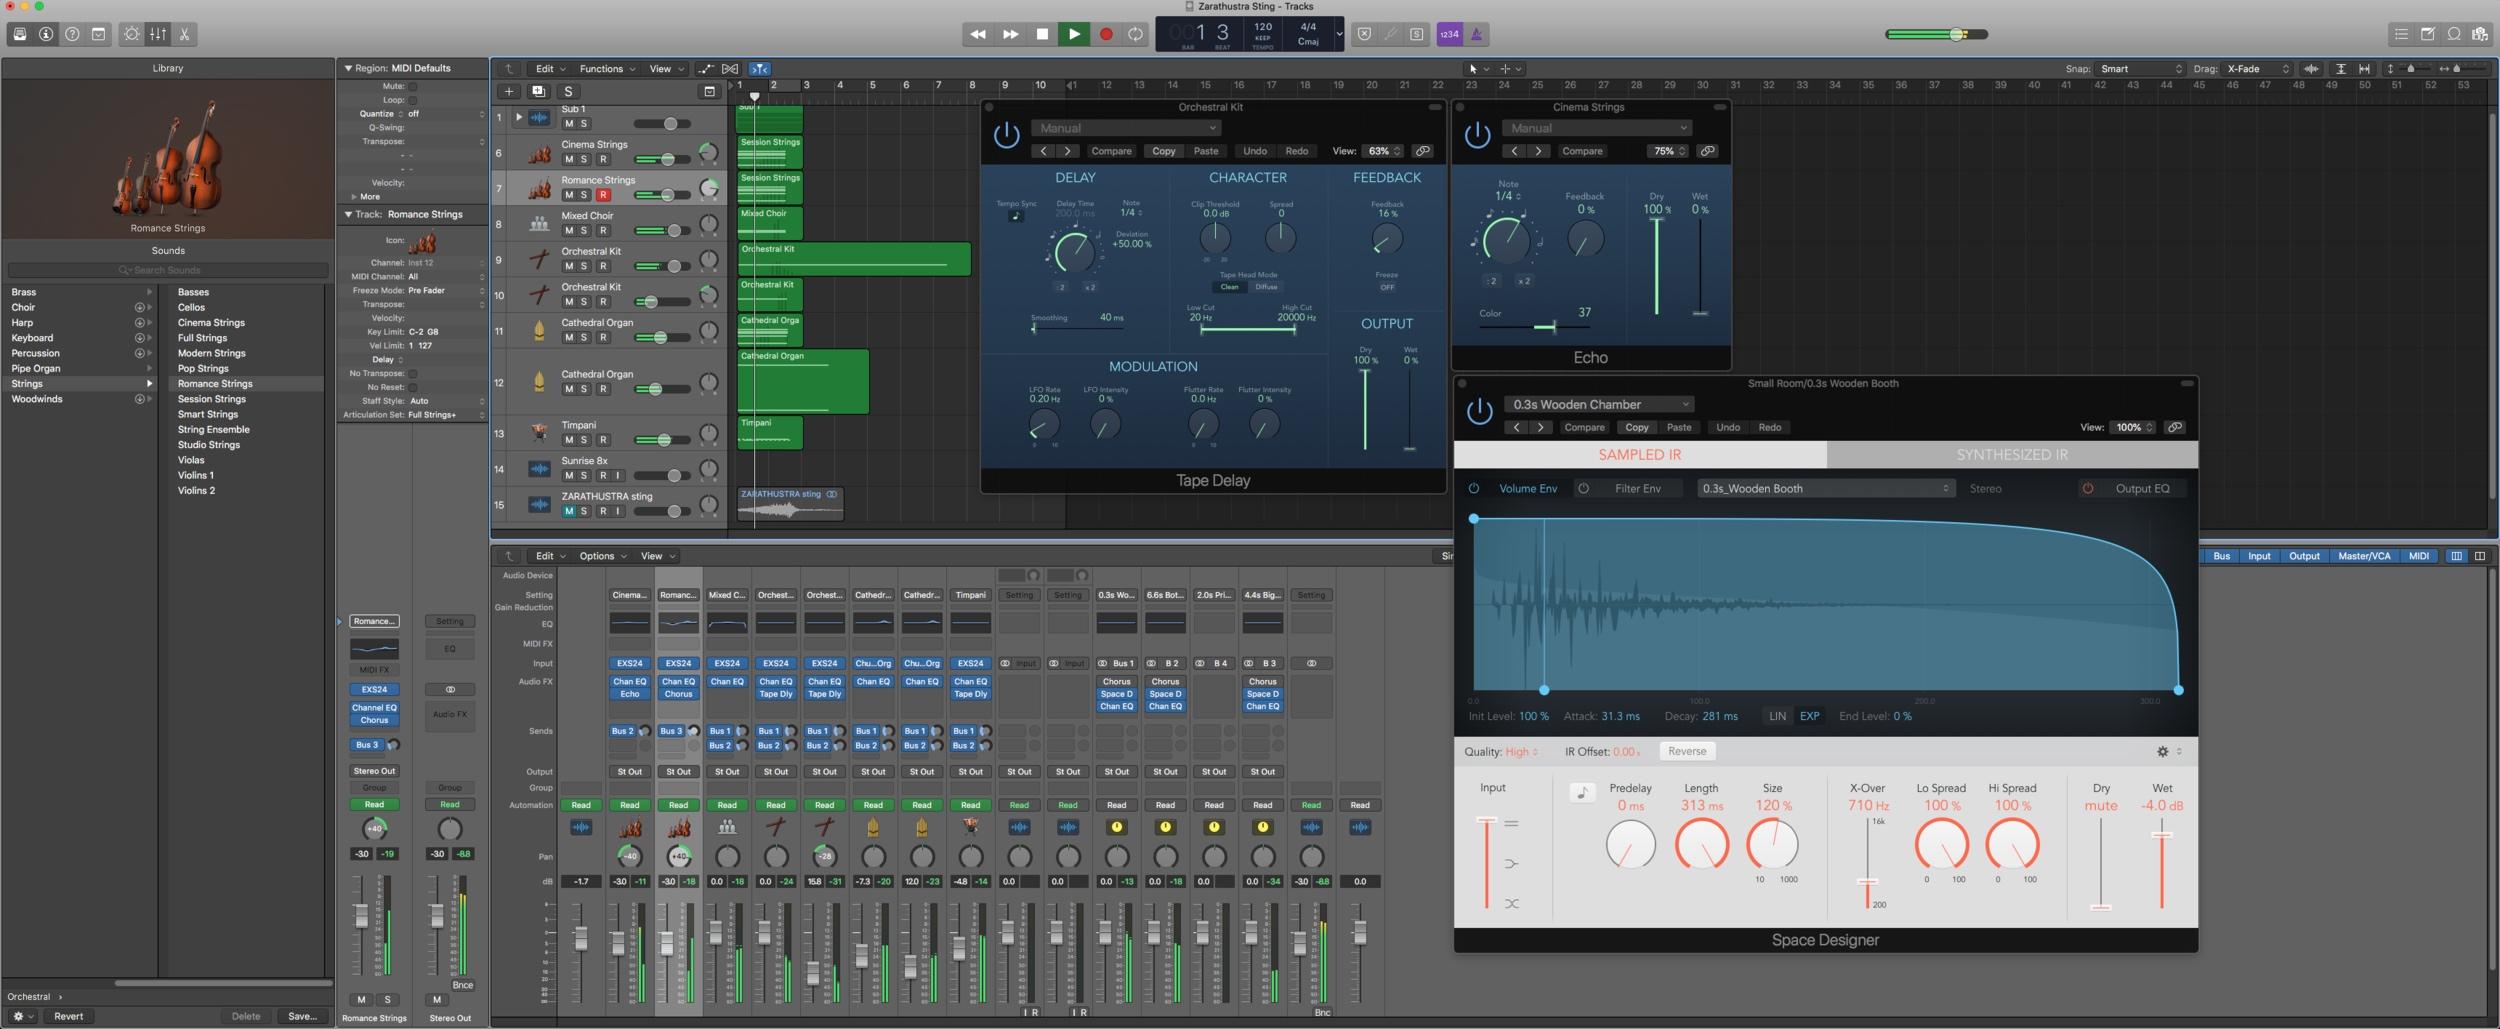 Rebuilding the iconic crescendo within Logic Pro X